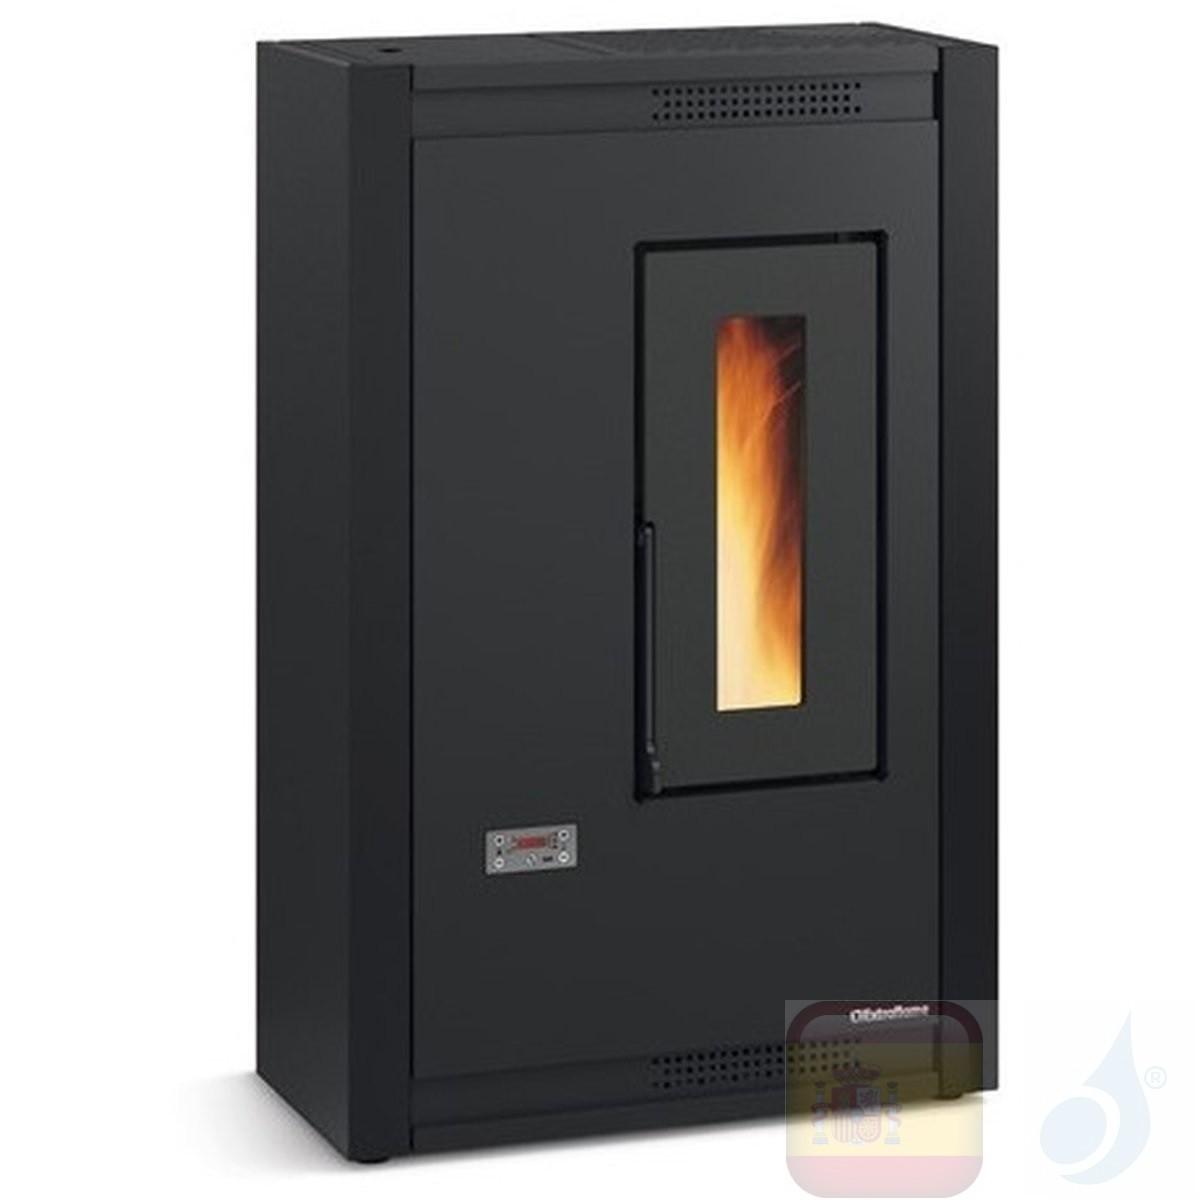 Estufa de pellets La Extraflame 4.4 kW Luisella metal Negro